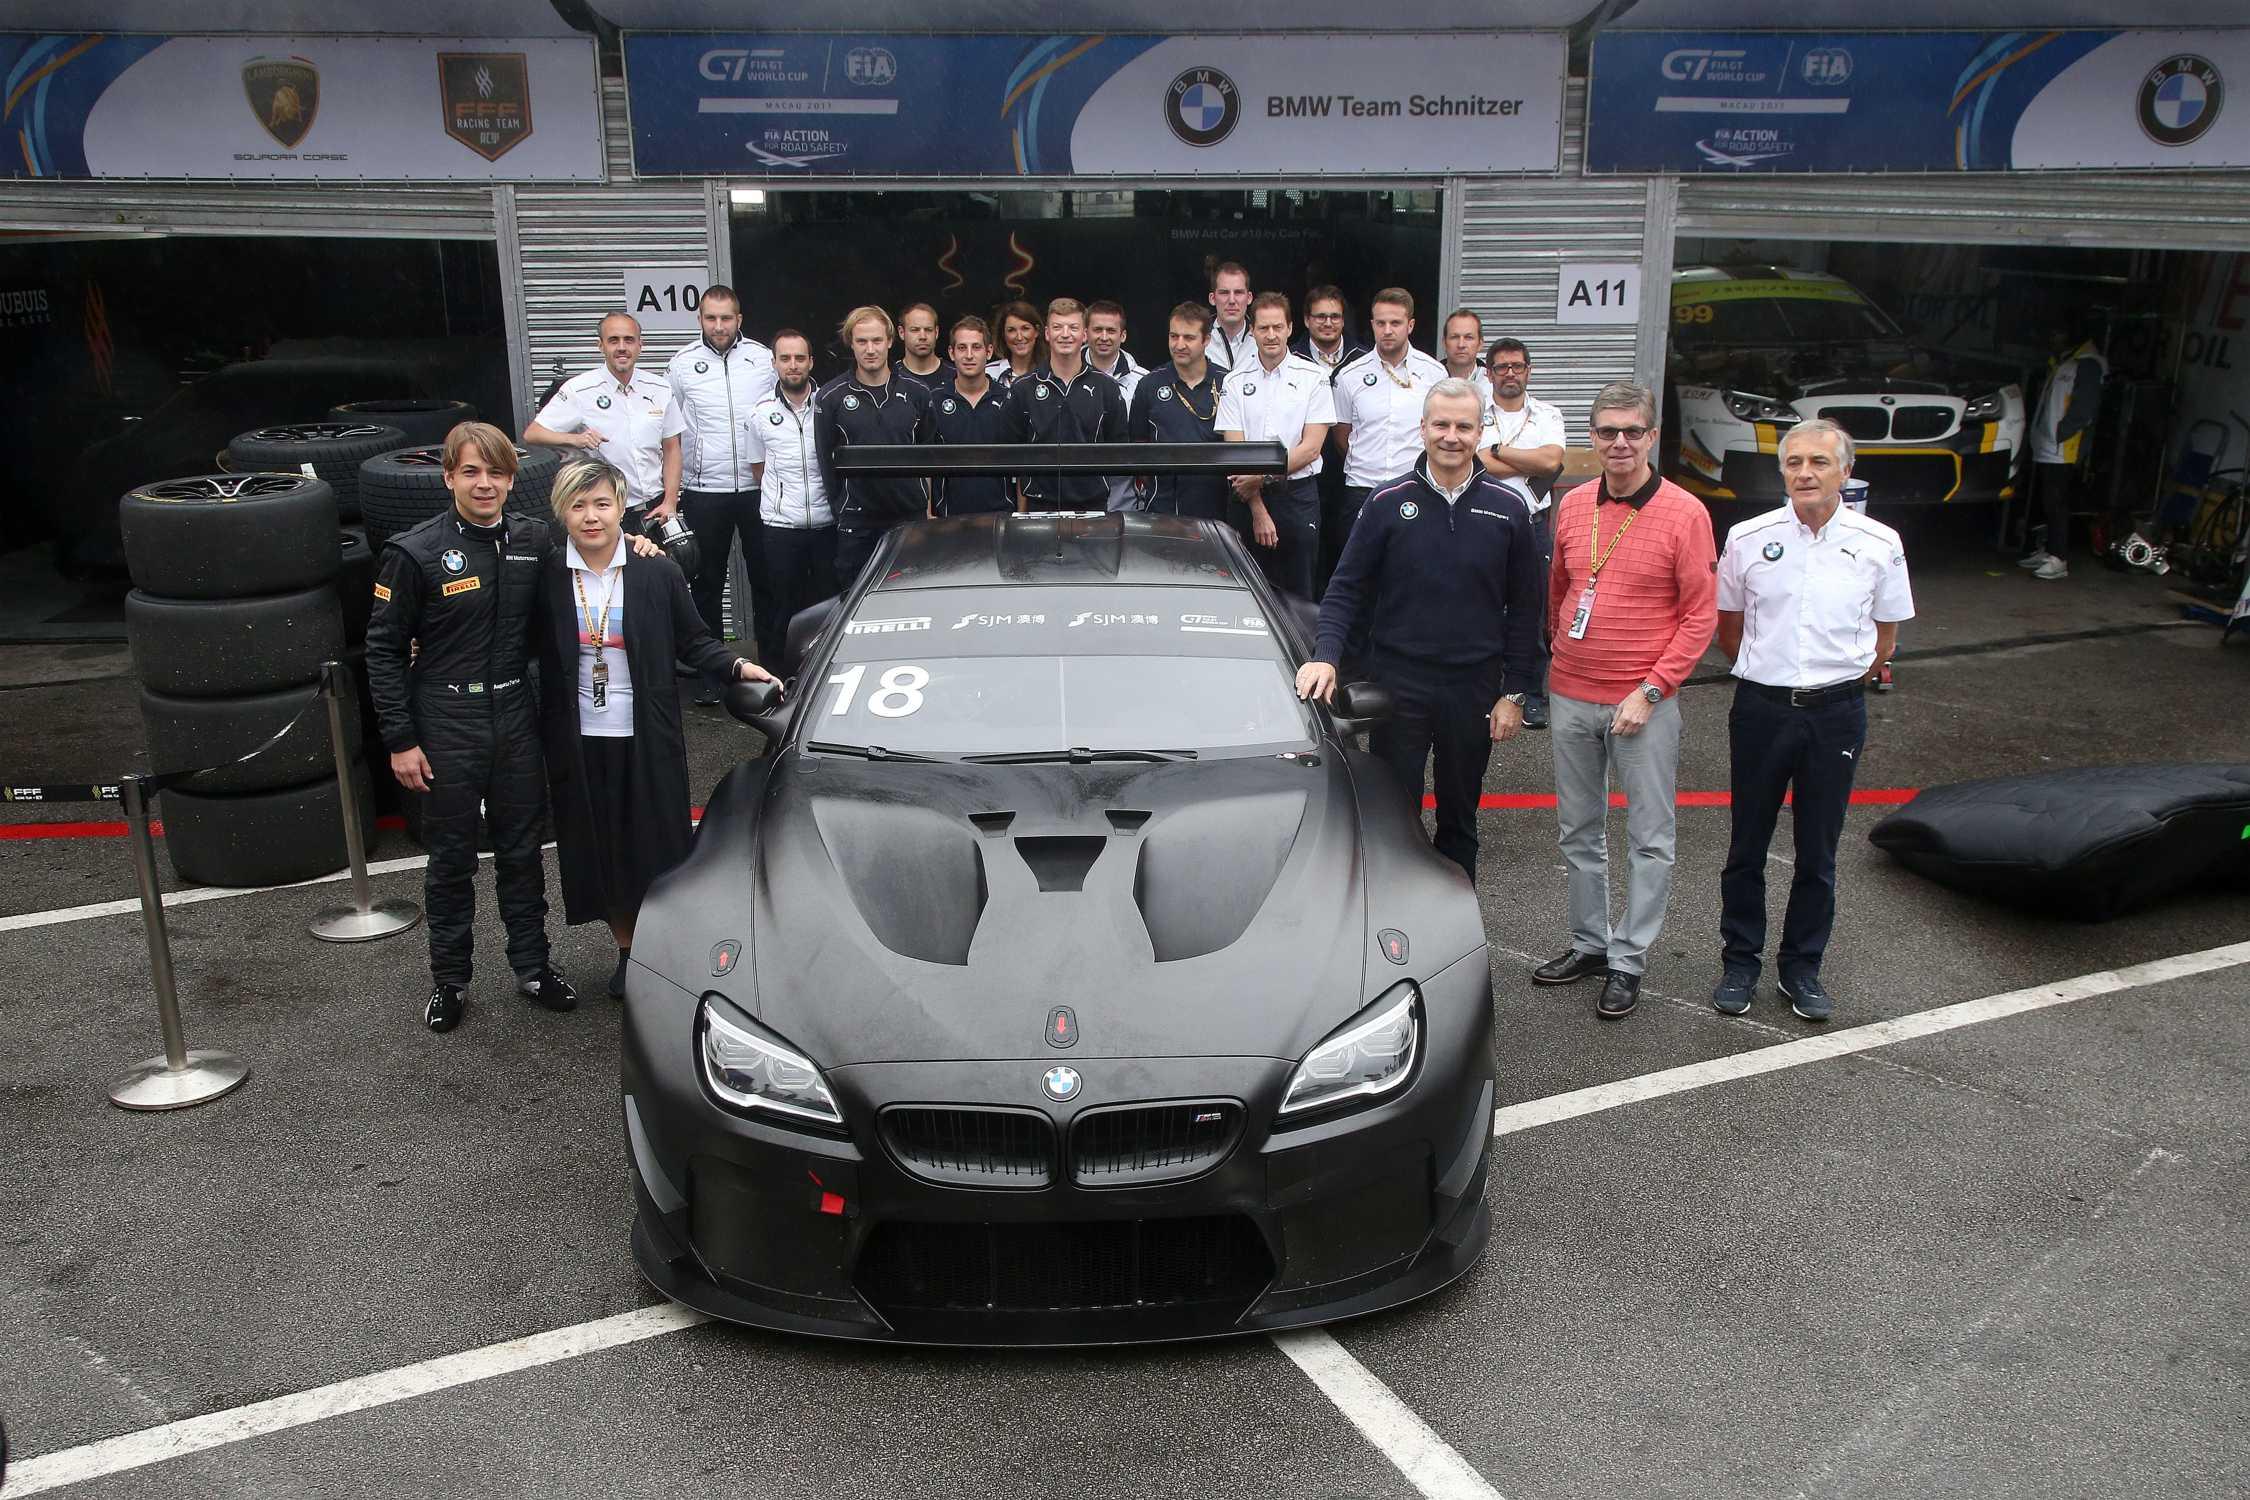 BMW Motorsport FIA GT World Cup Augusto Farfus BRA Cao Fei CHN Team Schnitzer Art Car 18 By Jens Marquardt GER